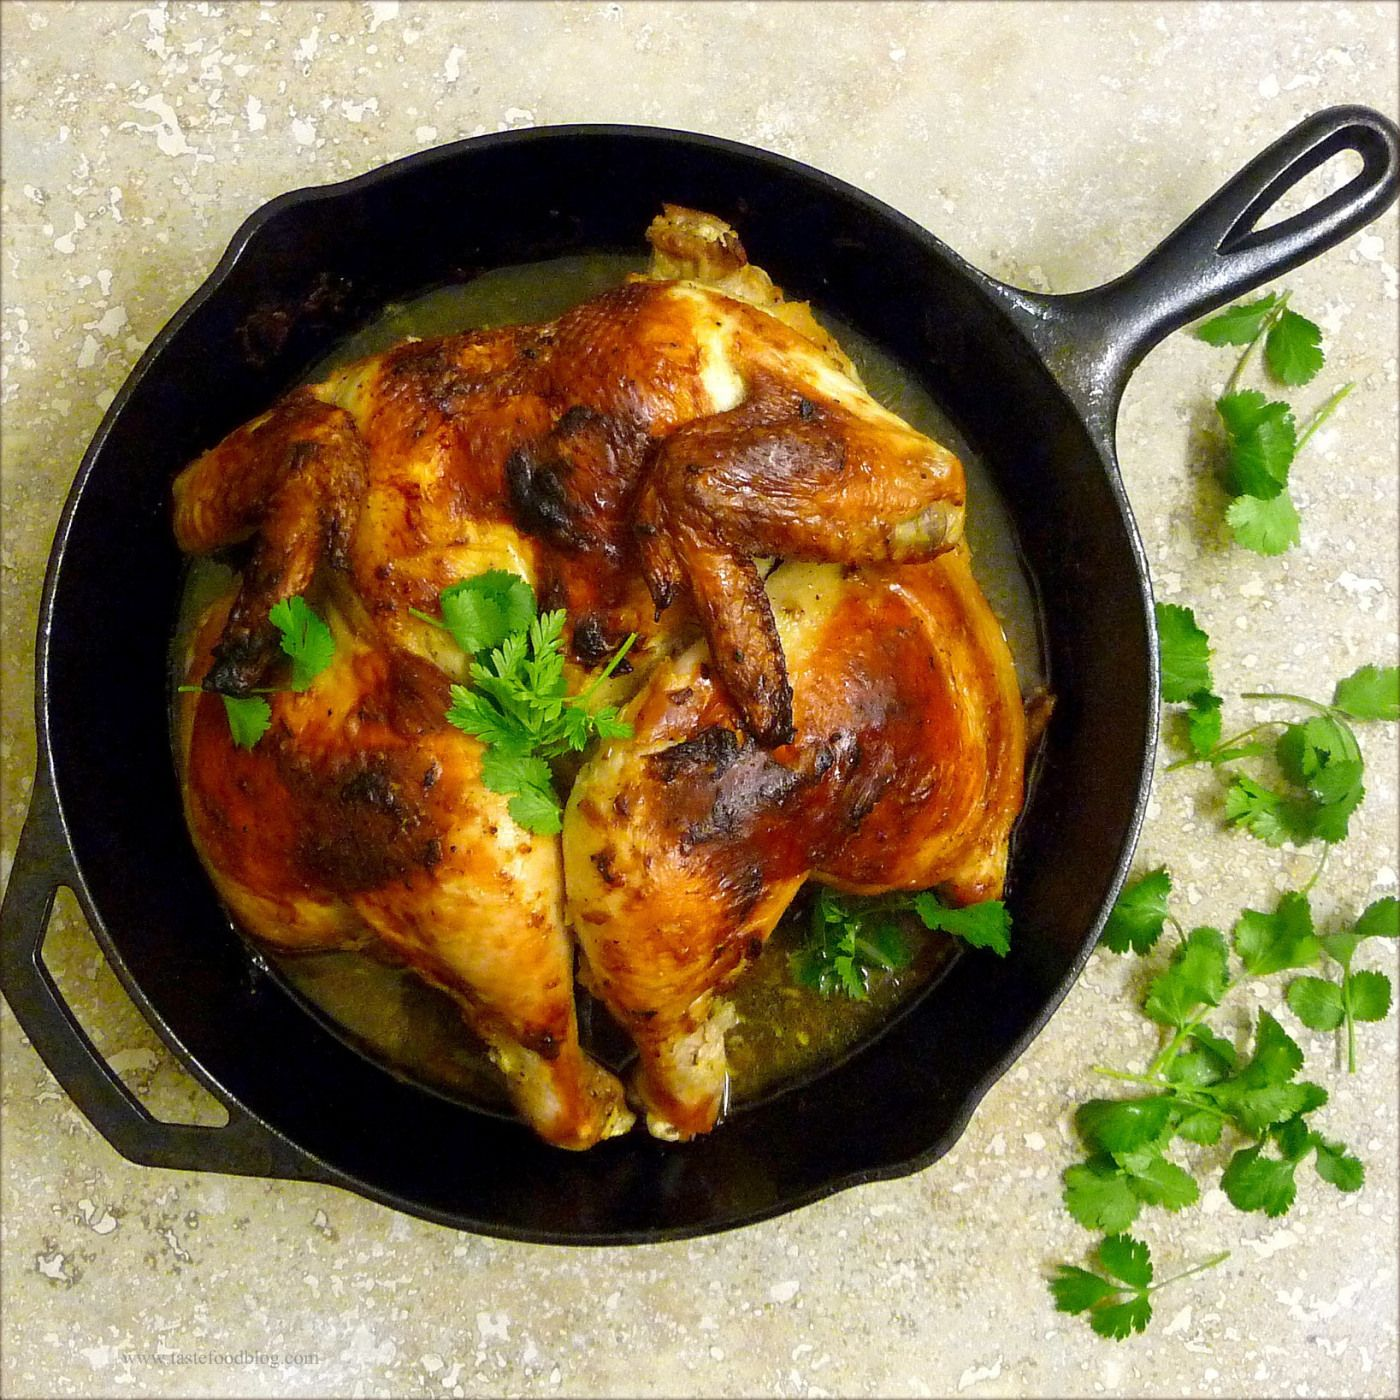 Roasted Chicken with Cardamom and Yogurt